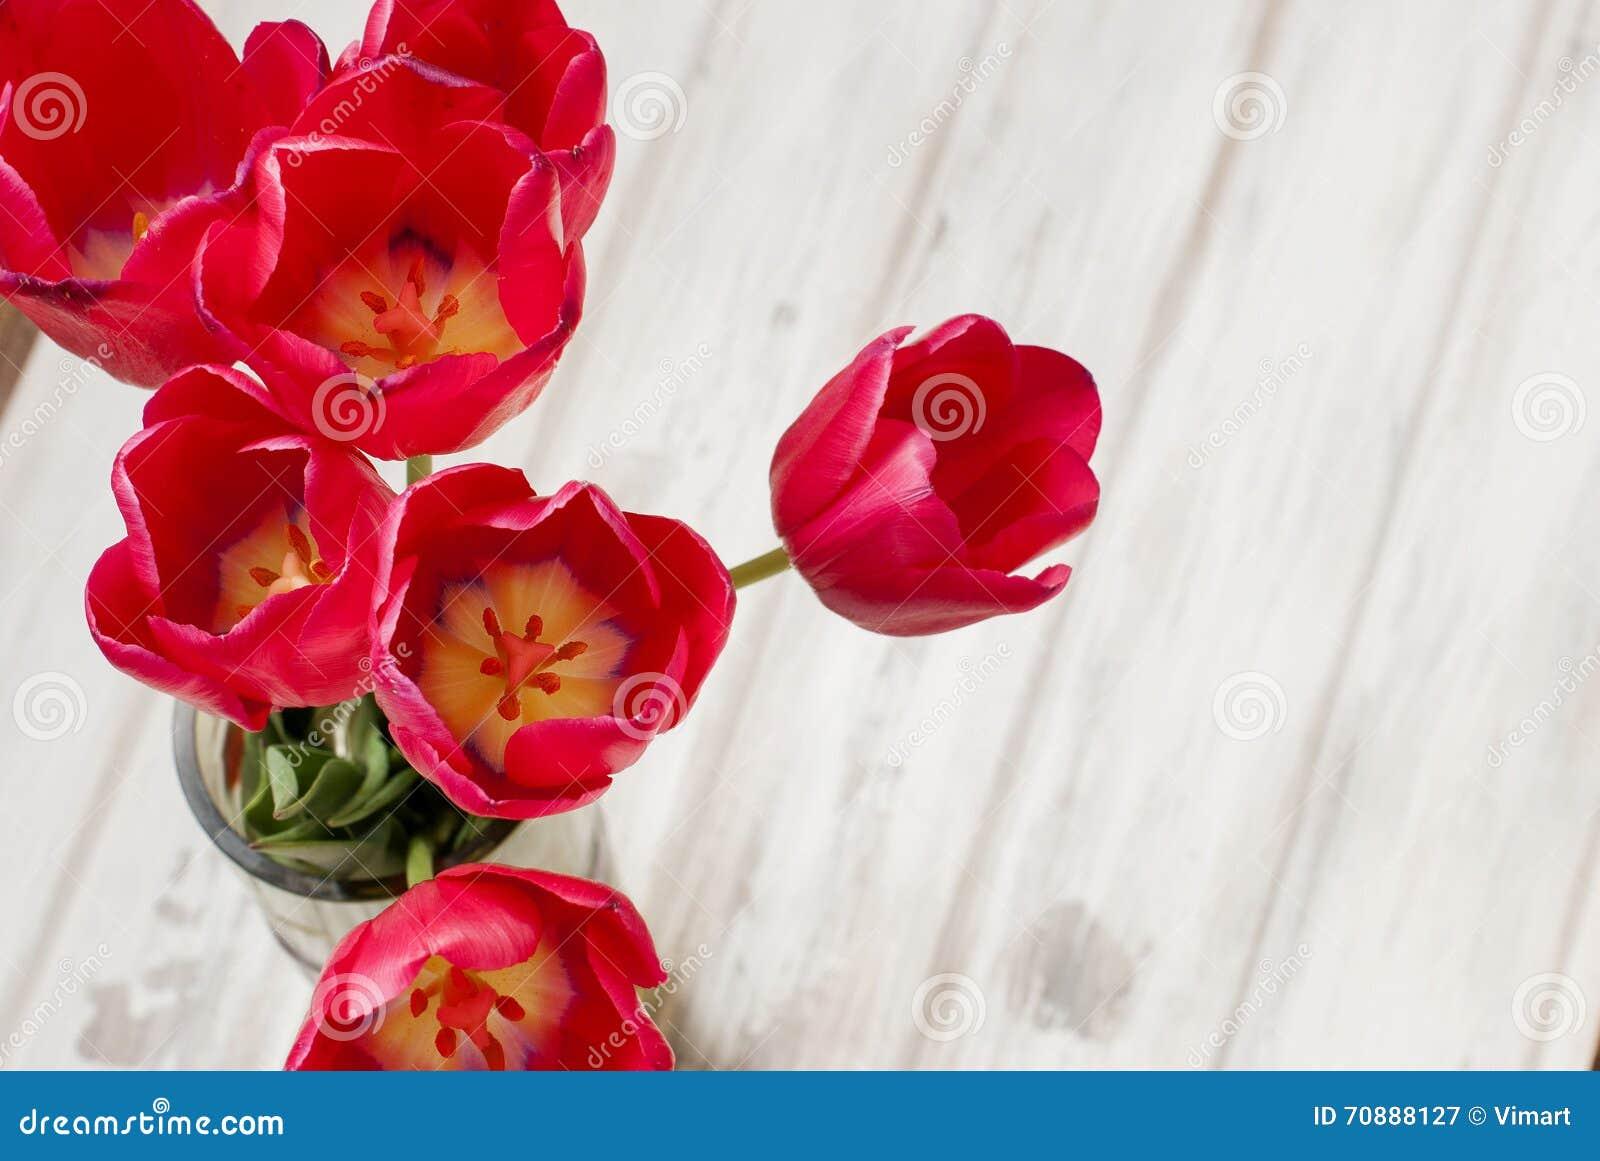 Весна цветет красная ваза ina тюльпанов